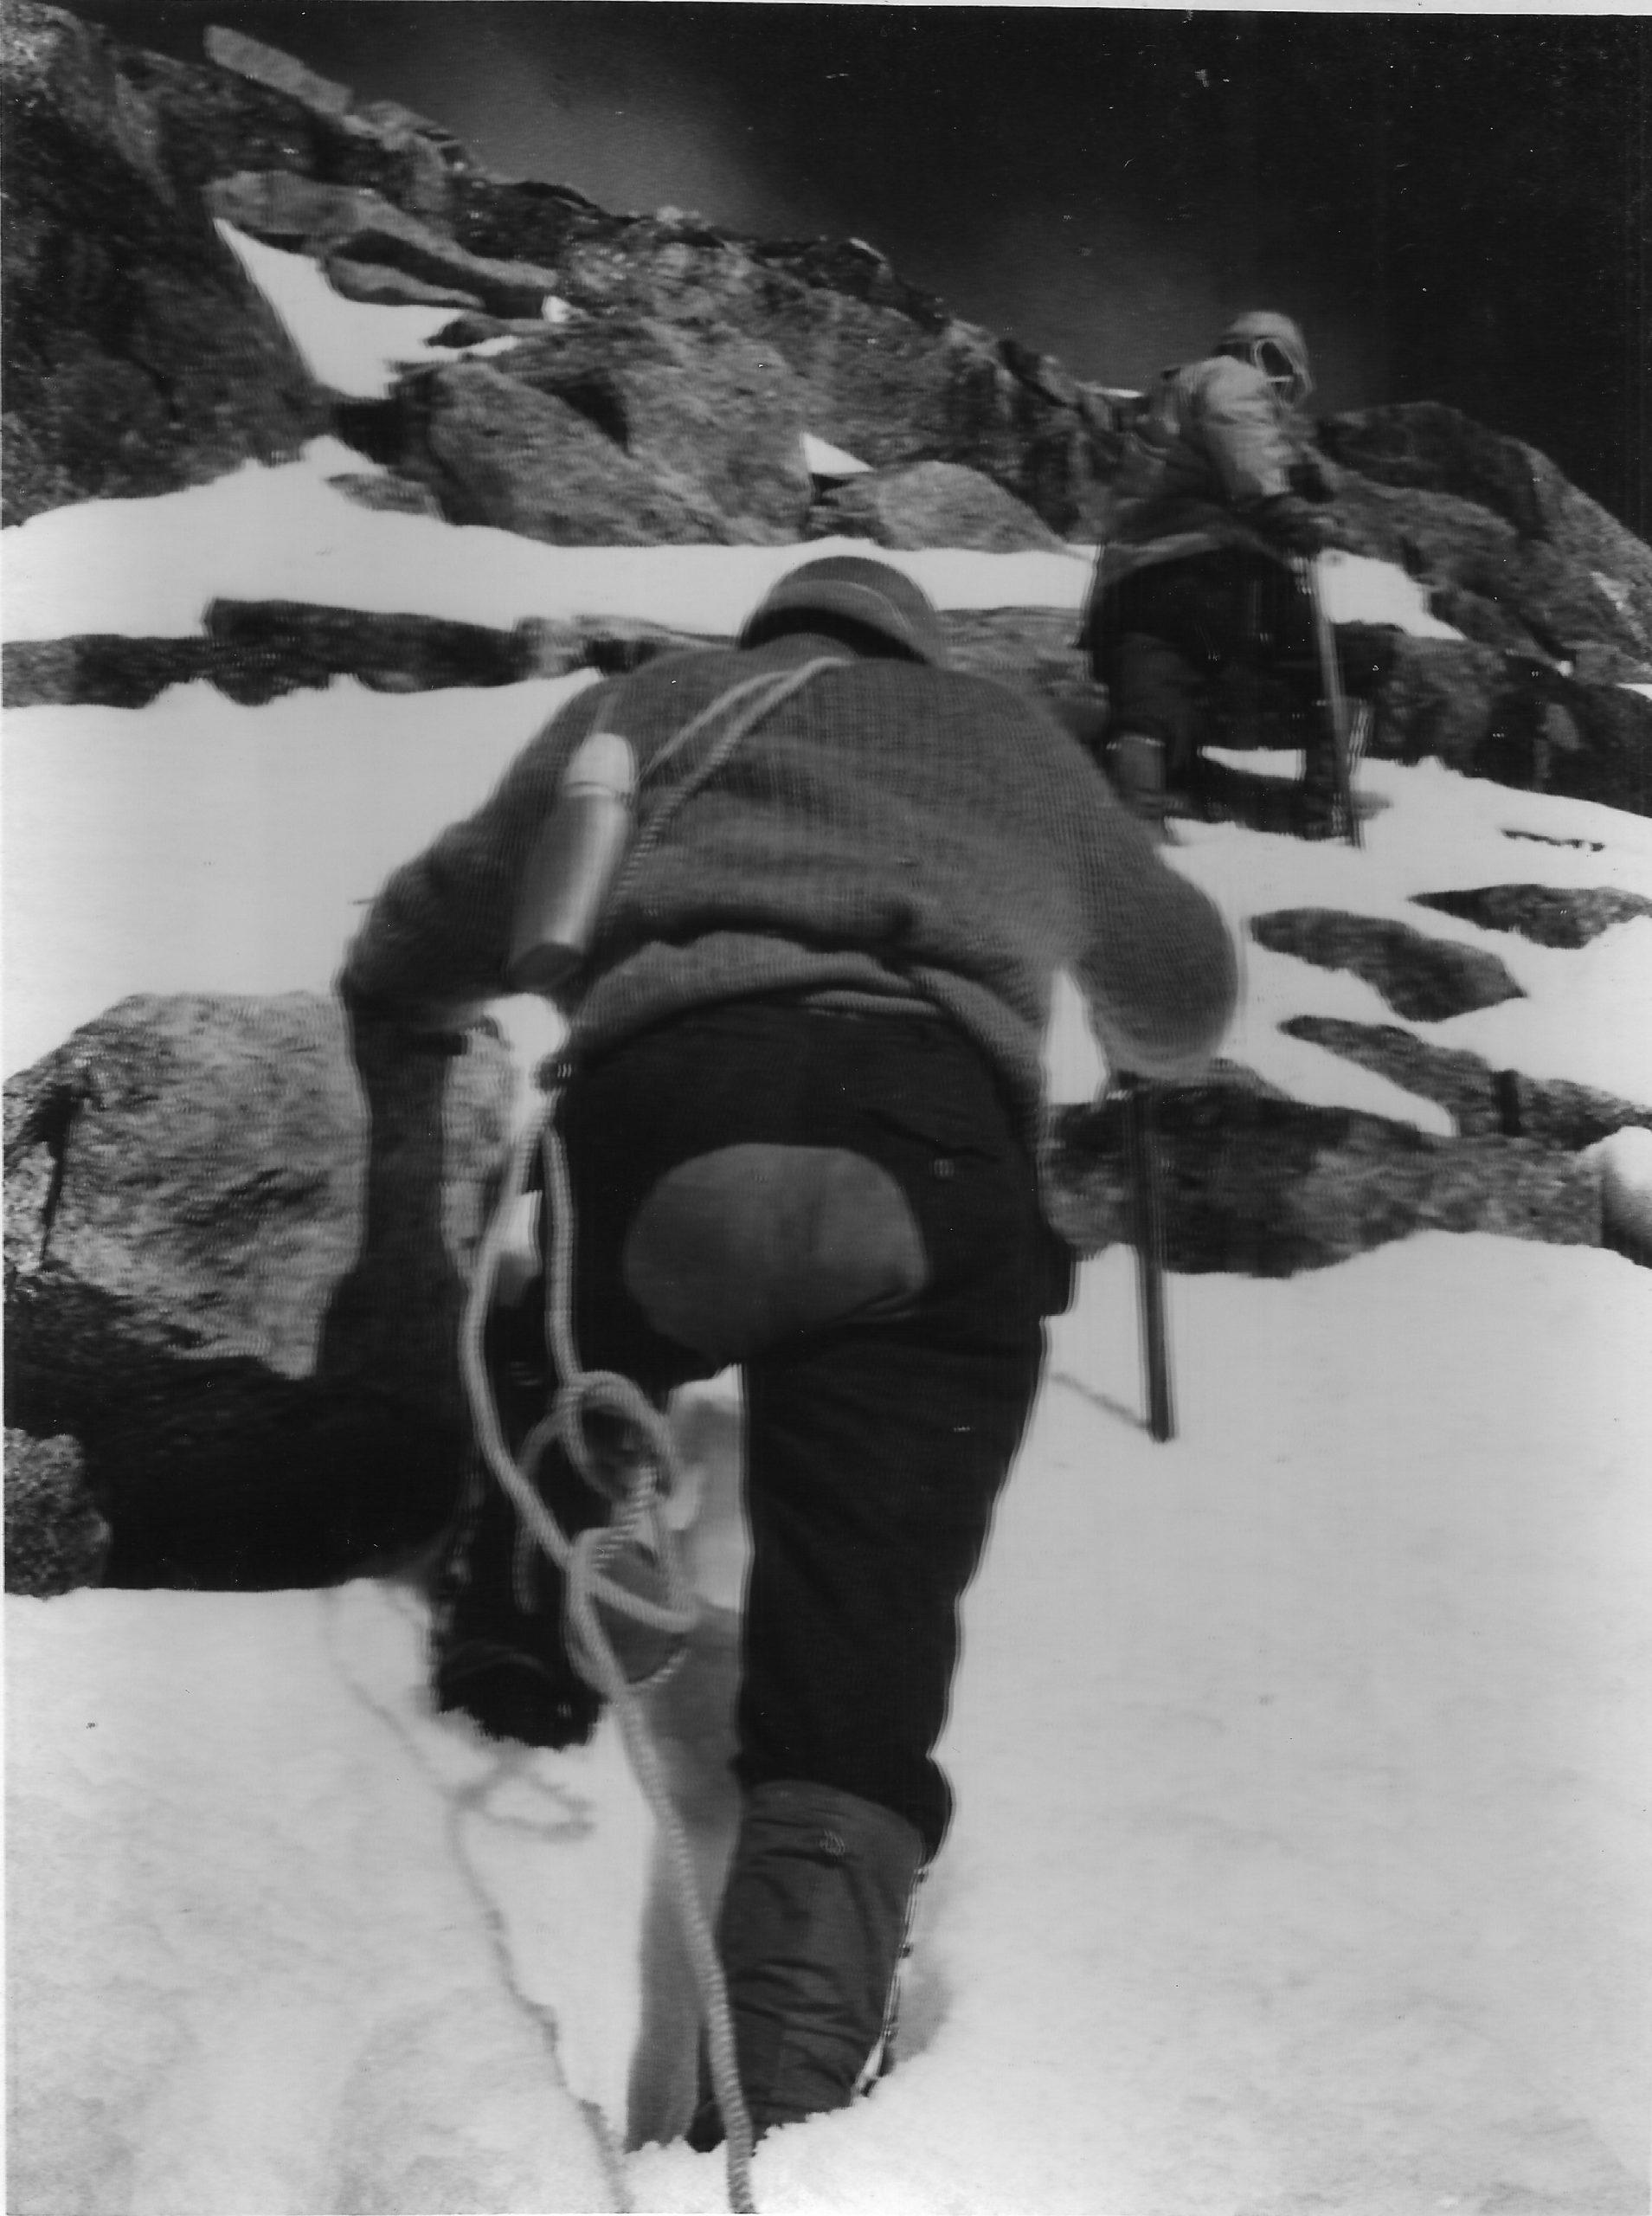 The Lalana ascent [image by: Sudipta Sengupta]